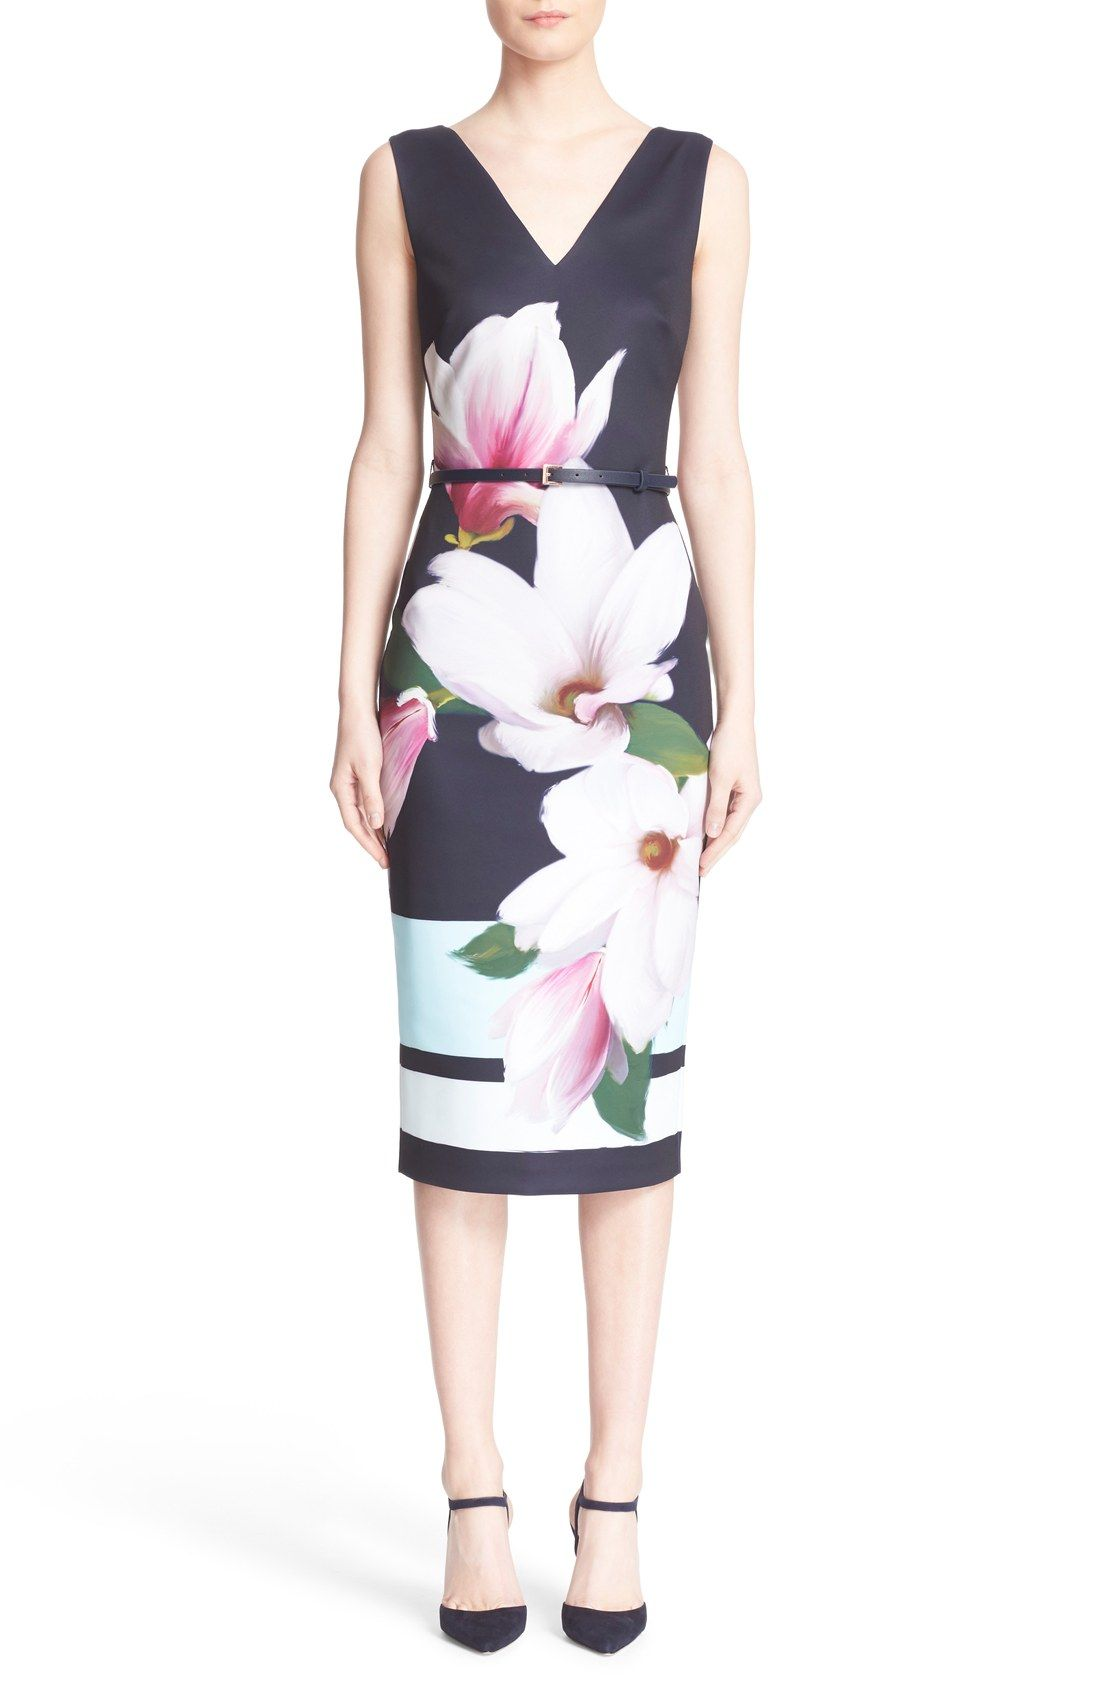 46725d3362b06dfa46cb6410696fb6af - Ted Baker Arienne Hanging Gardens Dress